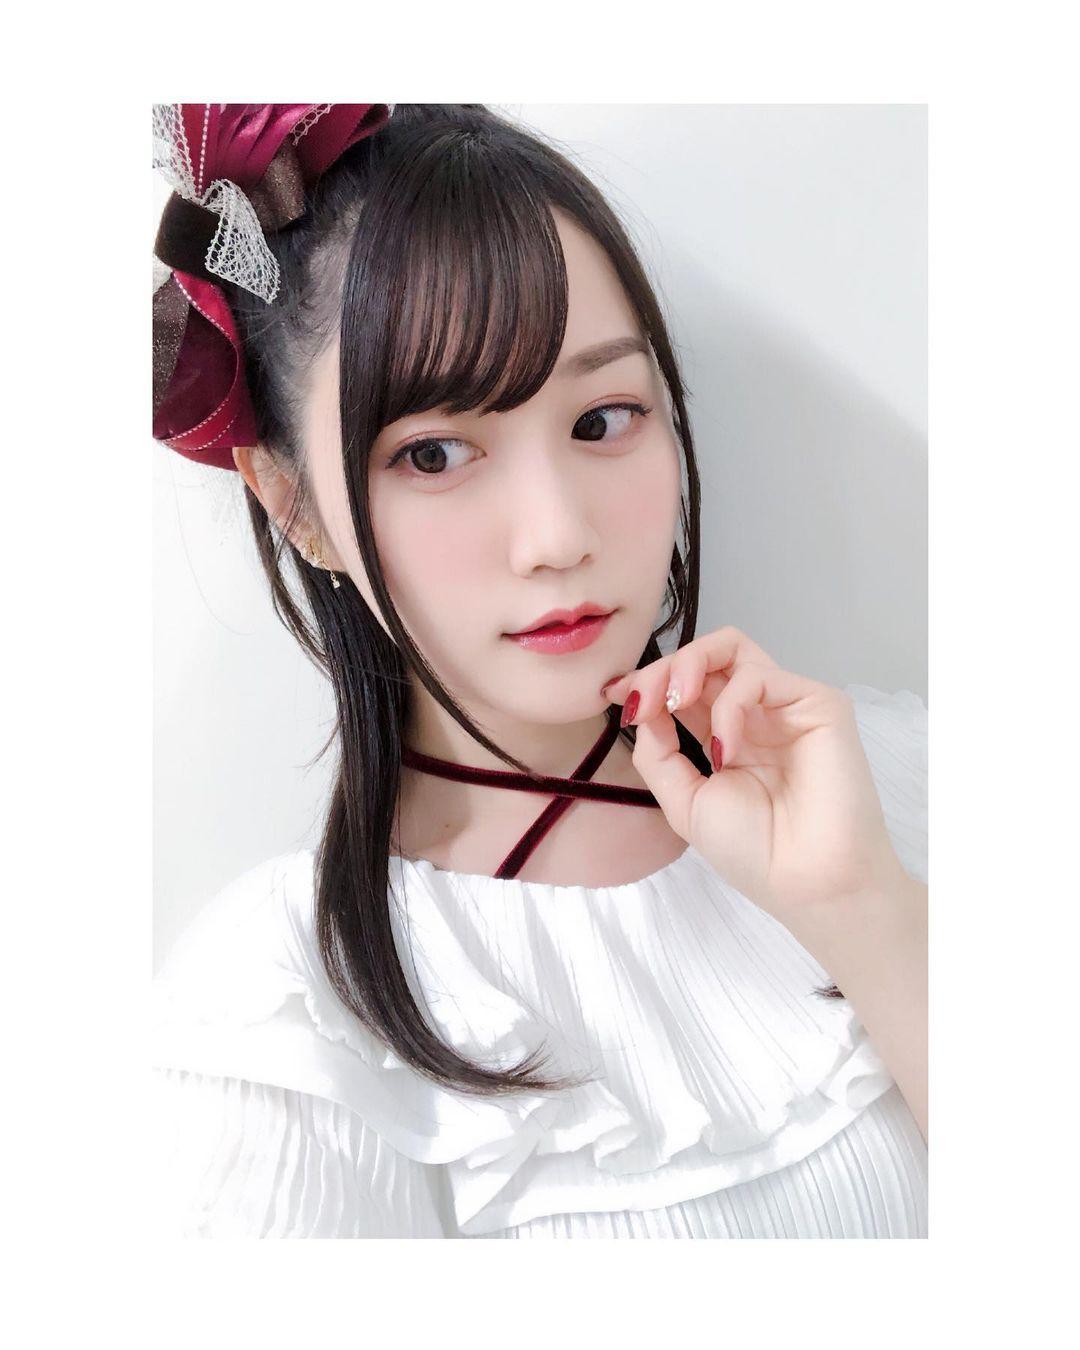 ogura_yui183.jpg